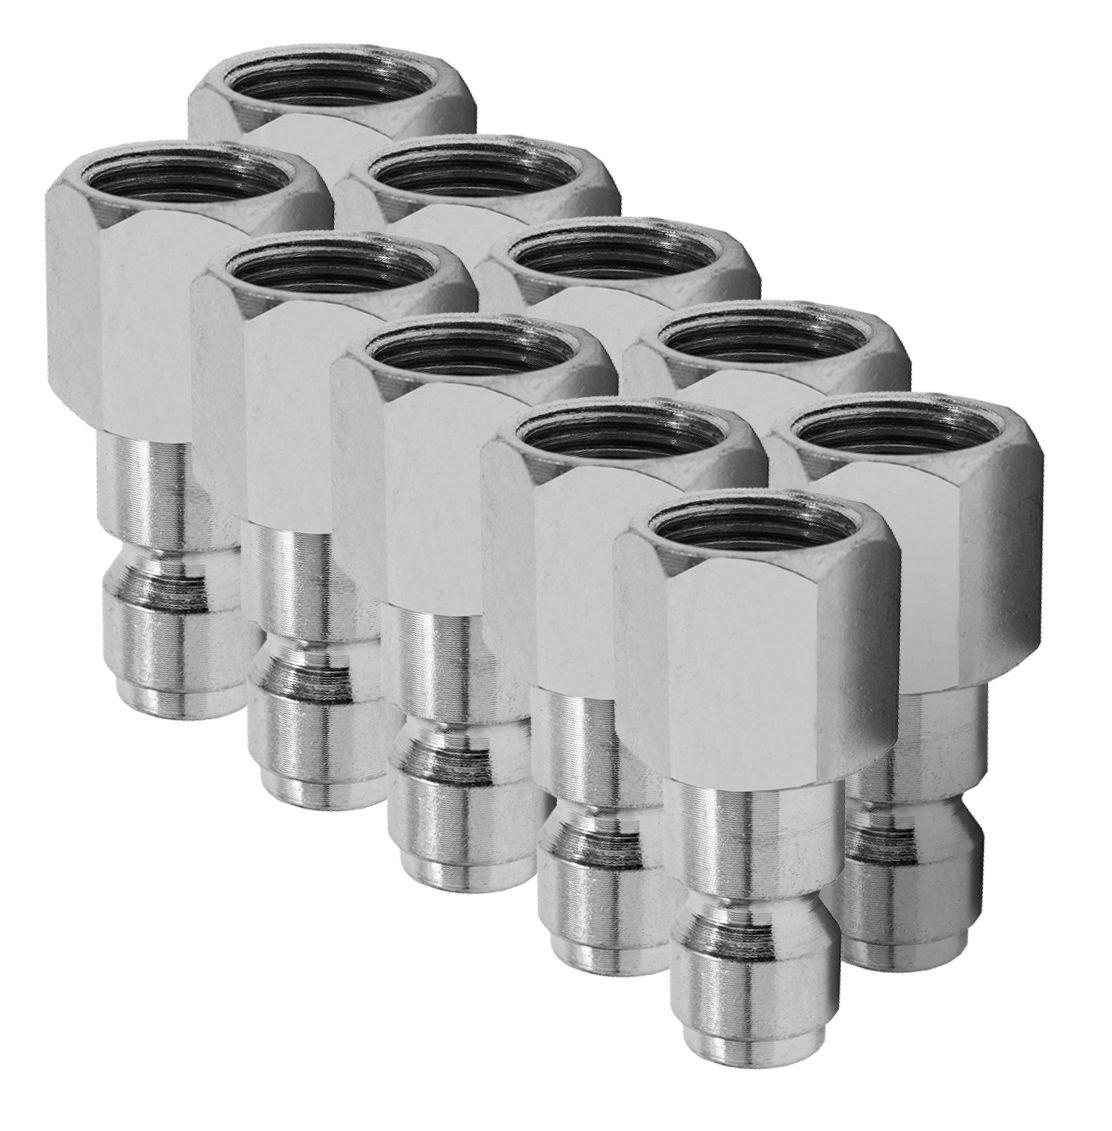 Hot Max 28134 Industrial//Milton 1//4-Inch x 1//4-Inch Male NPT Plug 10-Pack